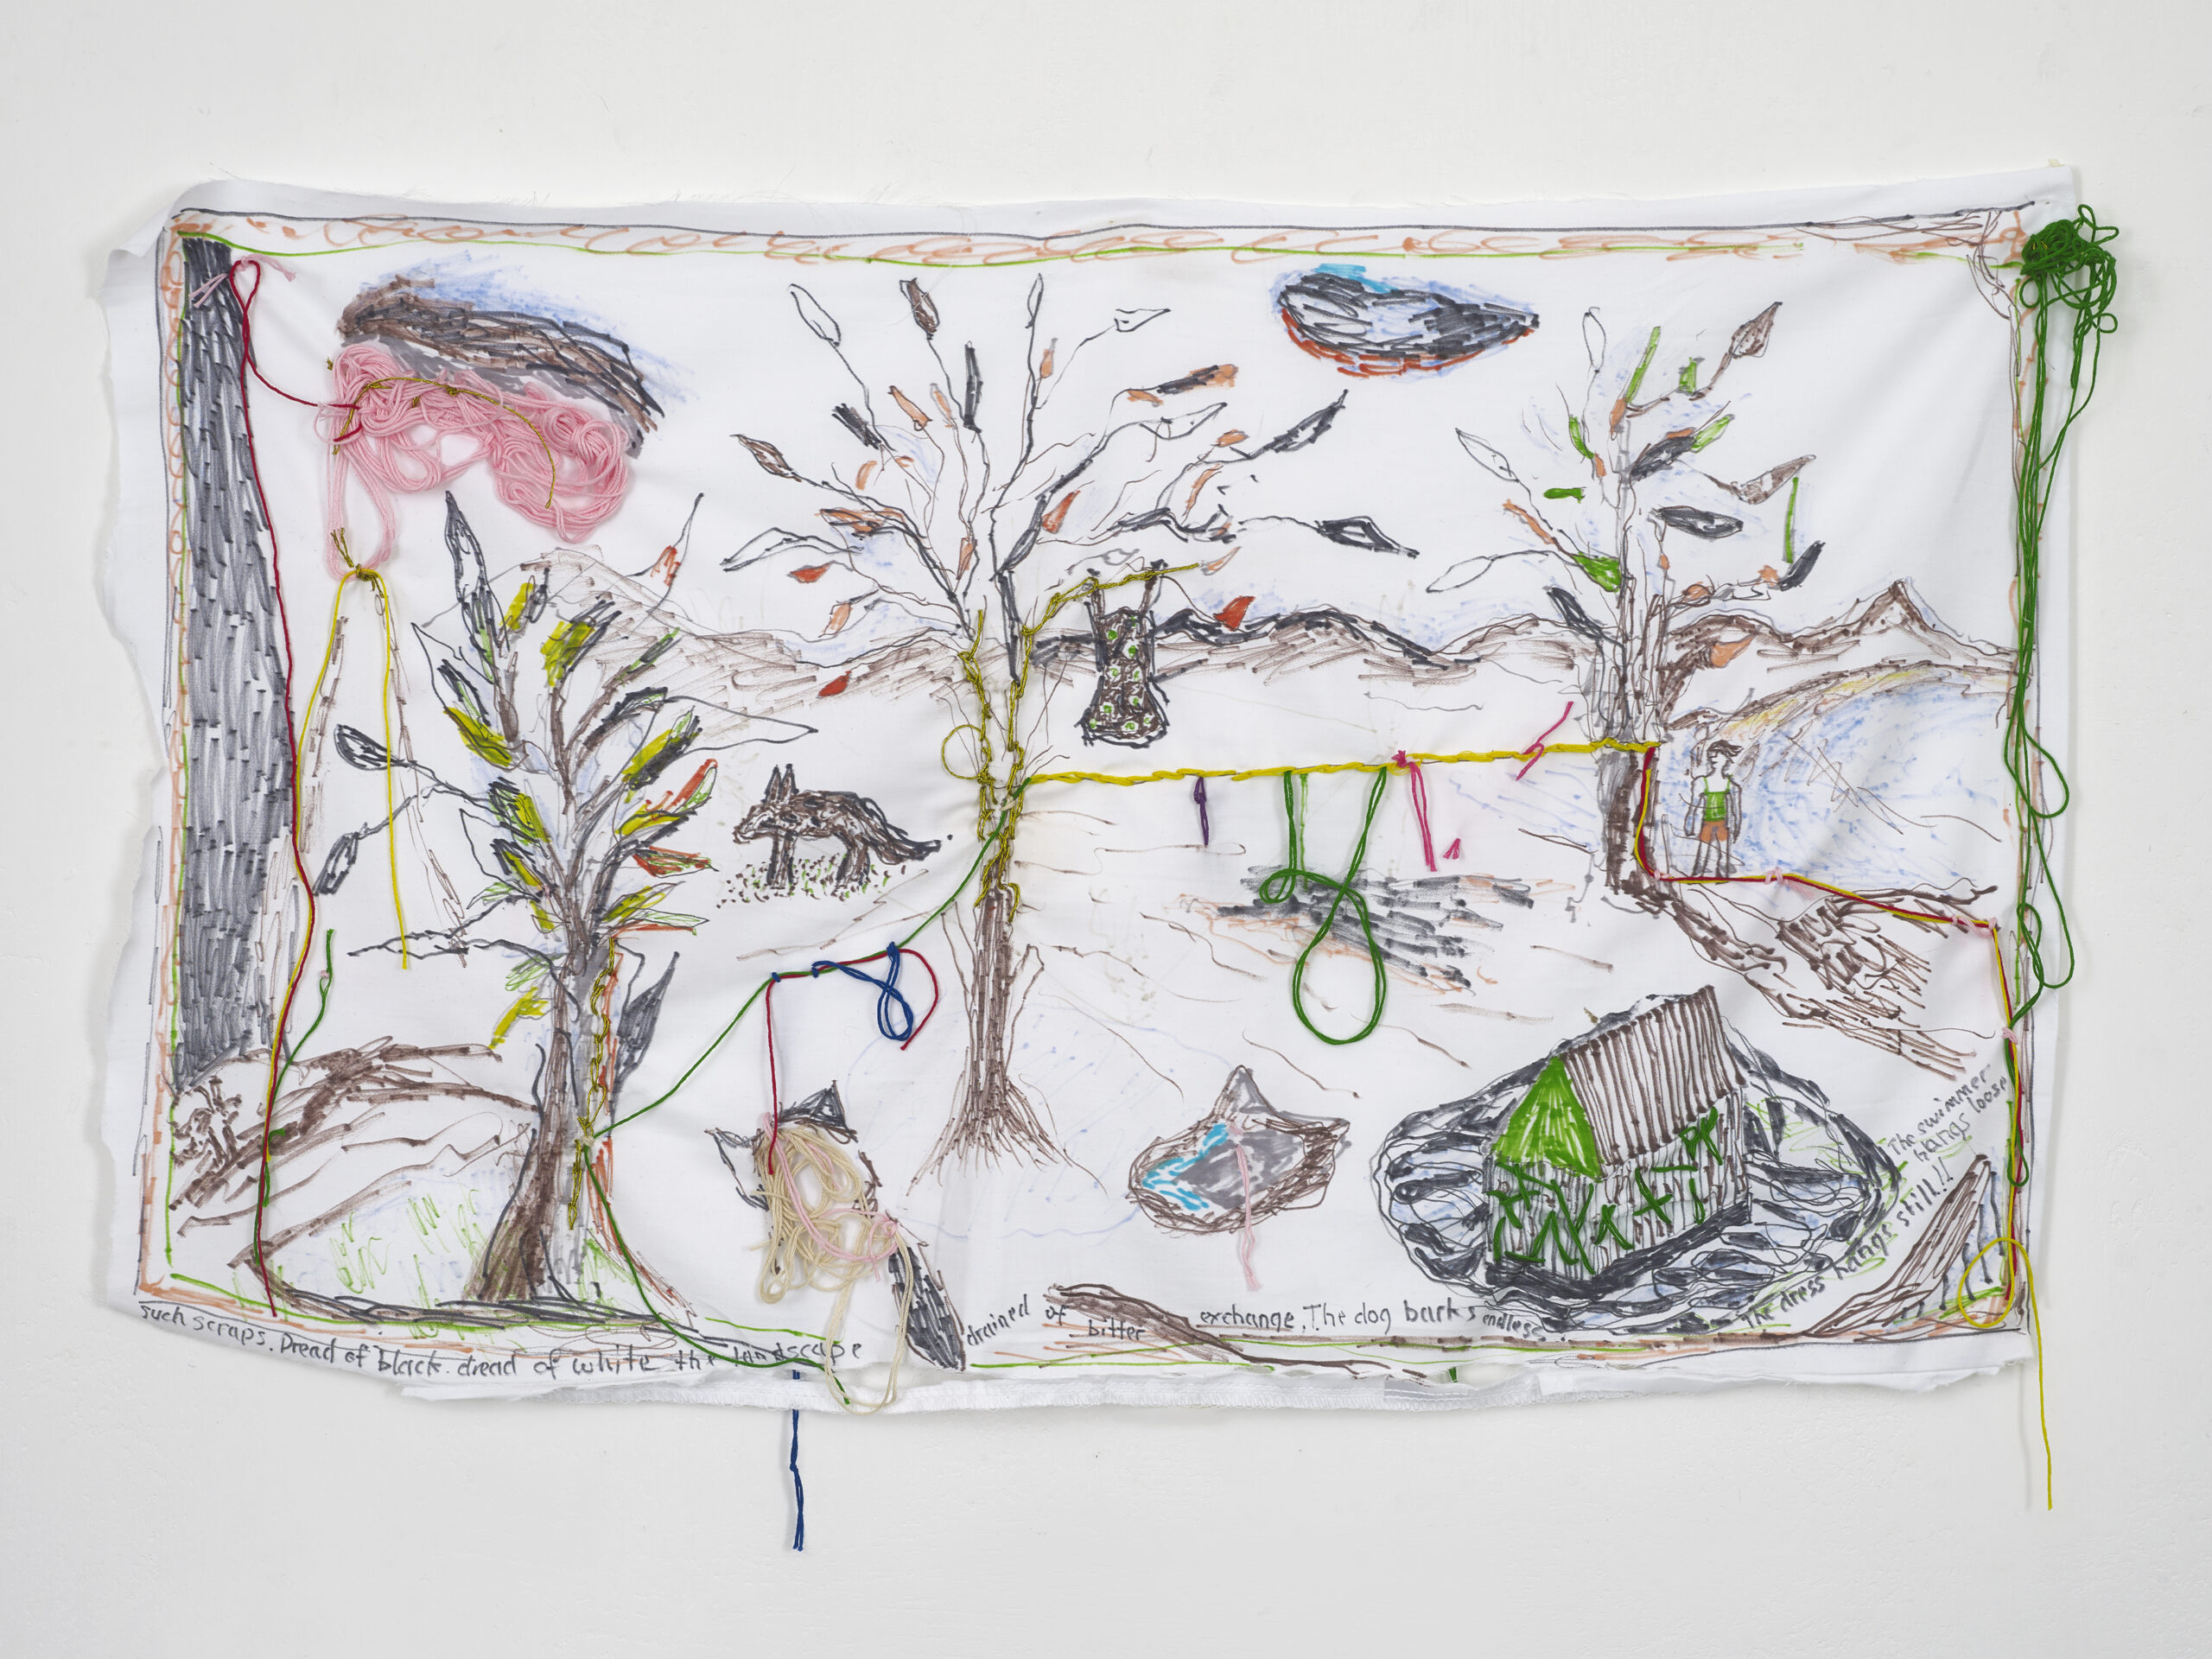 Brian Dawn Chalkley The dog barks endless (2020) Pencil, felt tip and thread on cotton pillow case, 75 cm x 45 cm.